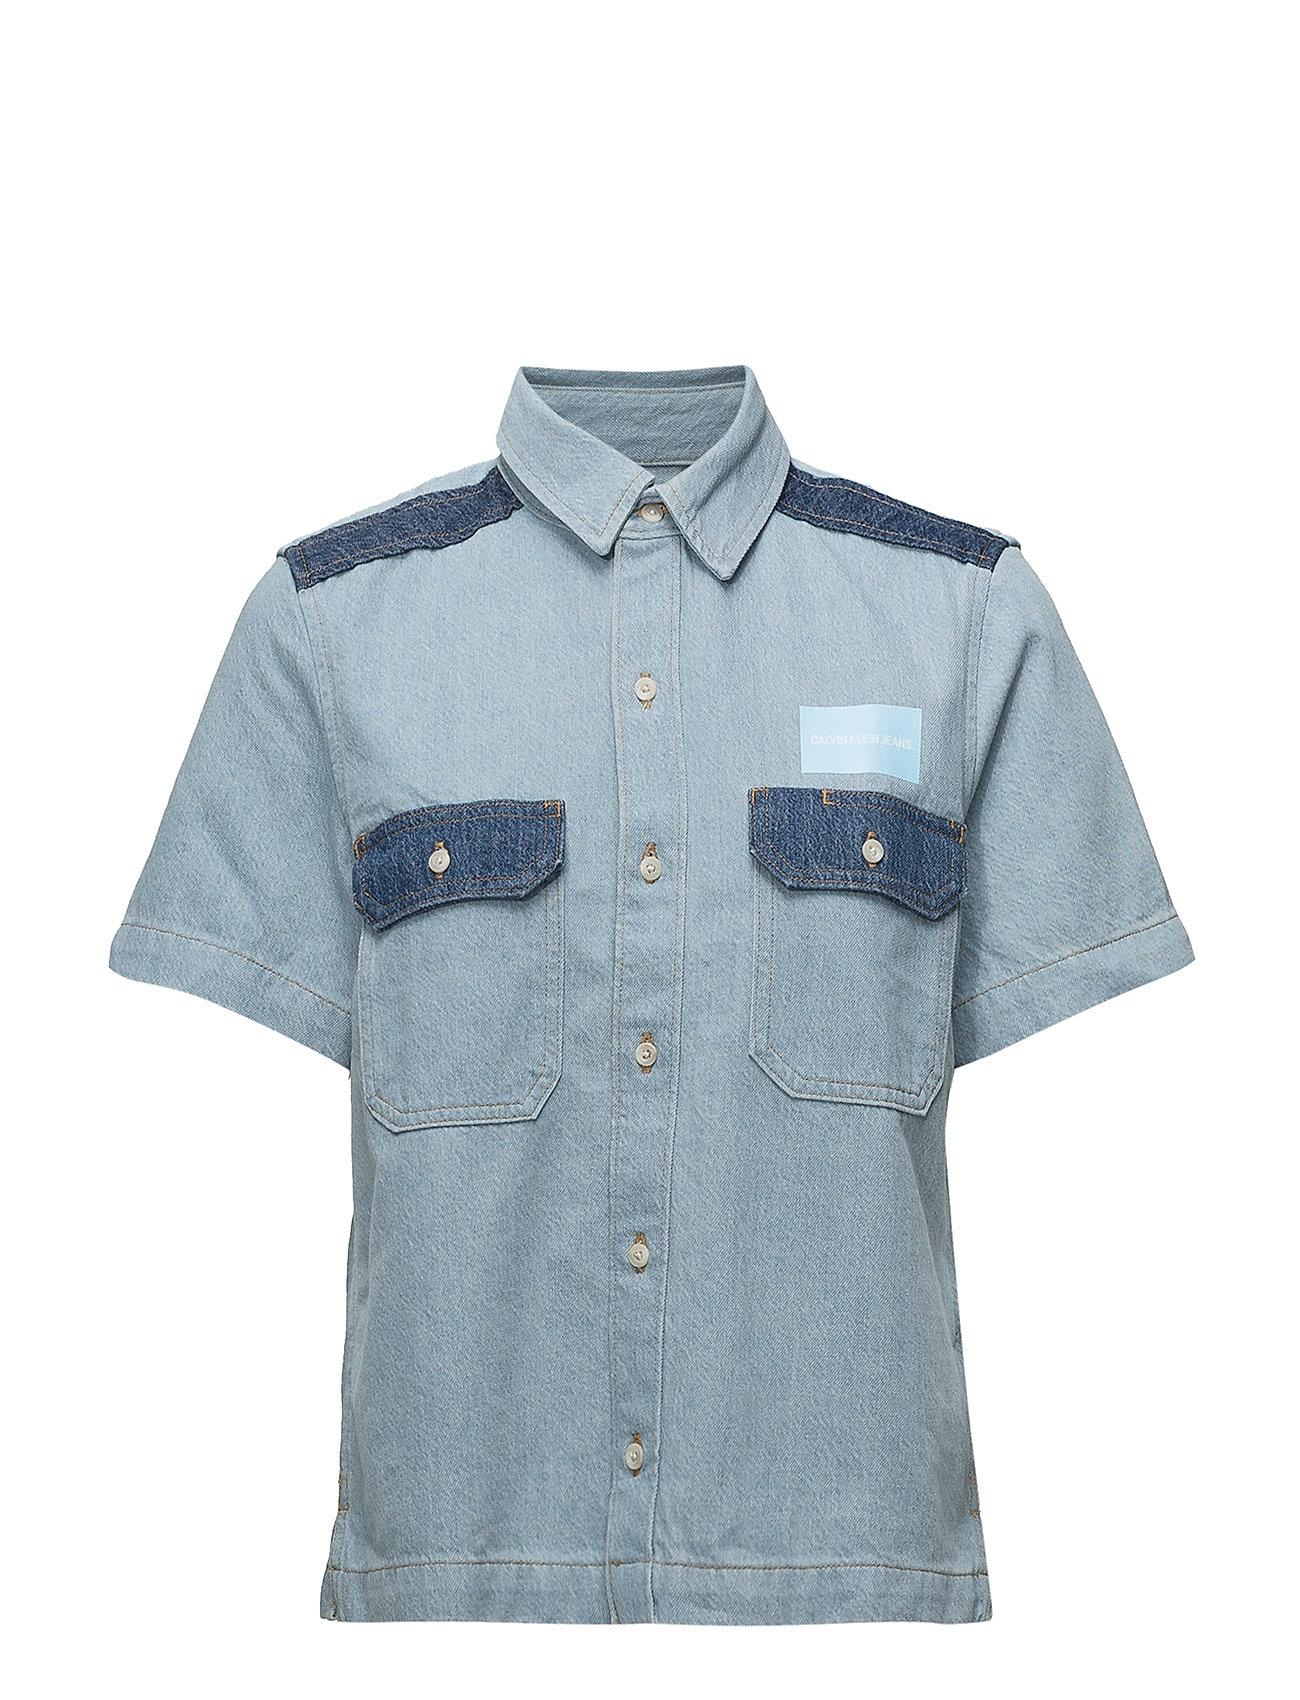 Calvin Klein Jeans SS Boxy Shirt blocke - IRWIN BLUE BLOCKED